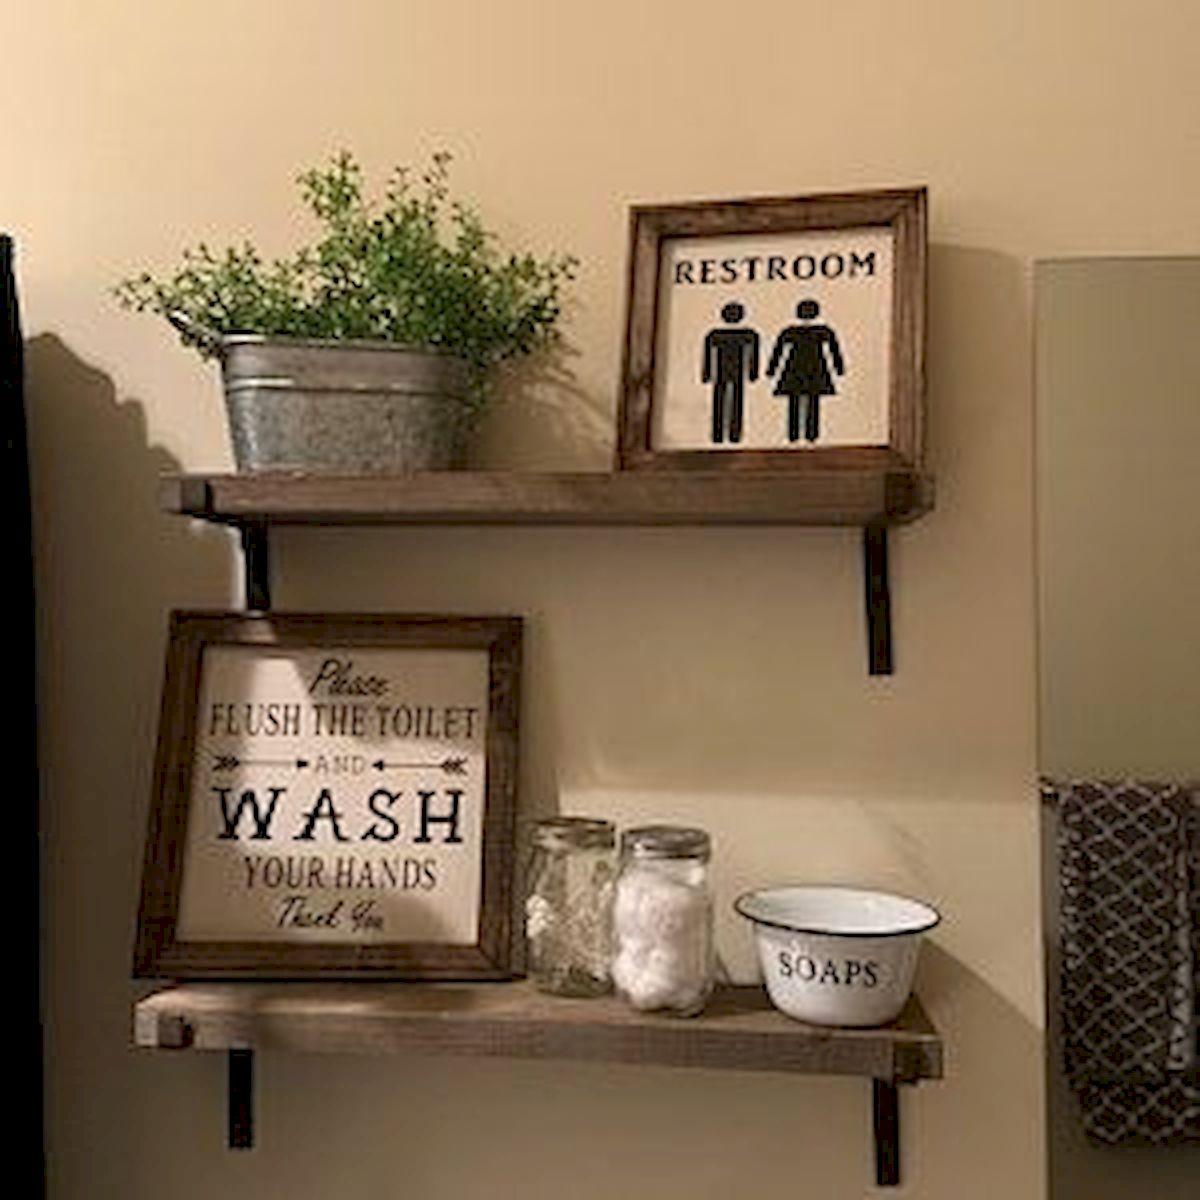 60+ Awesome Bathroom Decor and Design Ideas (56)